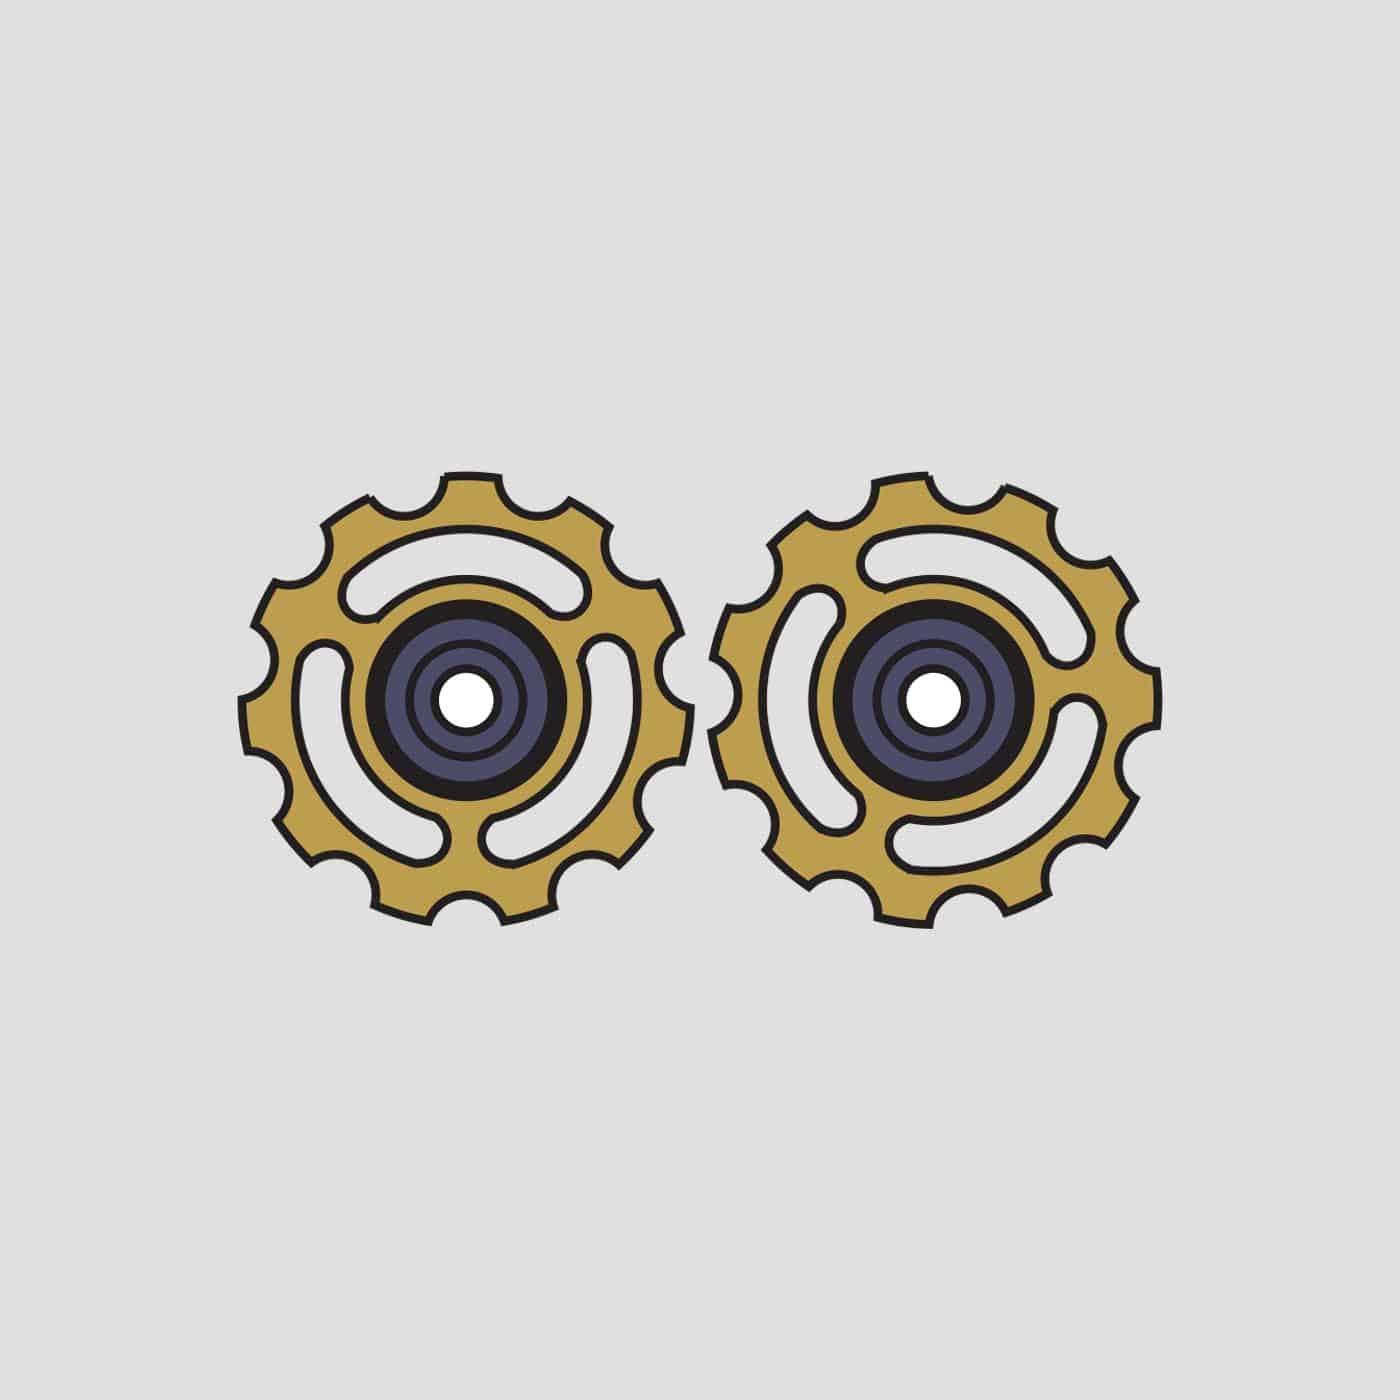 CyclingCeramic-Icon-Pulley-Wheels-Grey